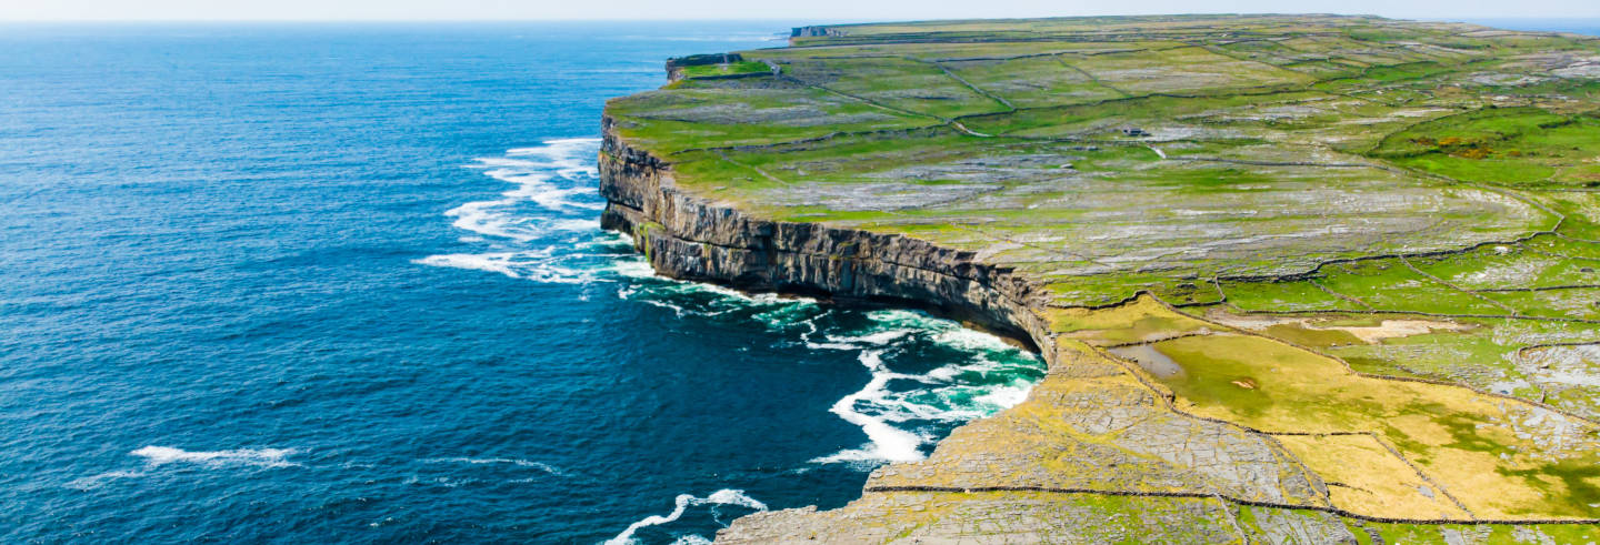 Isla Inishmore por libre en ferry